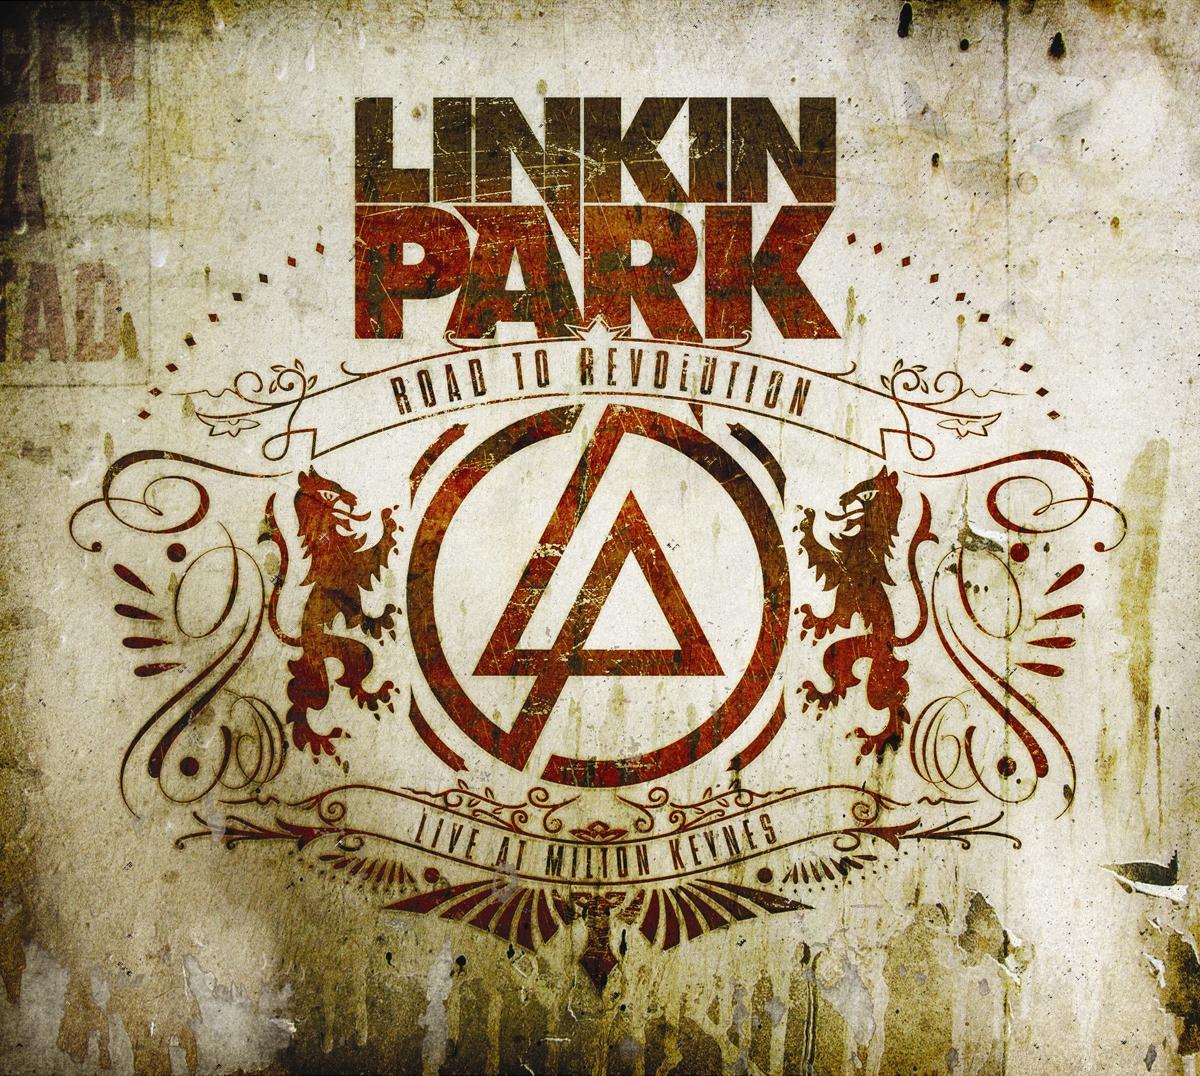 Linkin park bleed it out lyrics clean